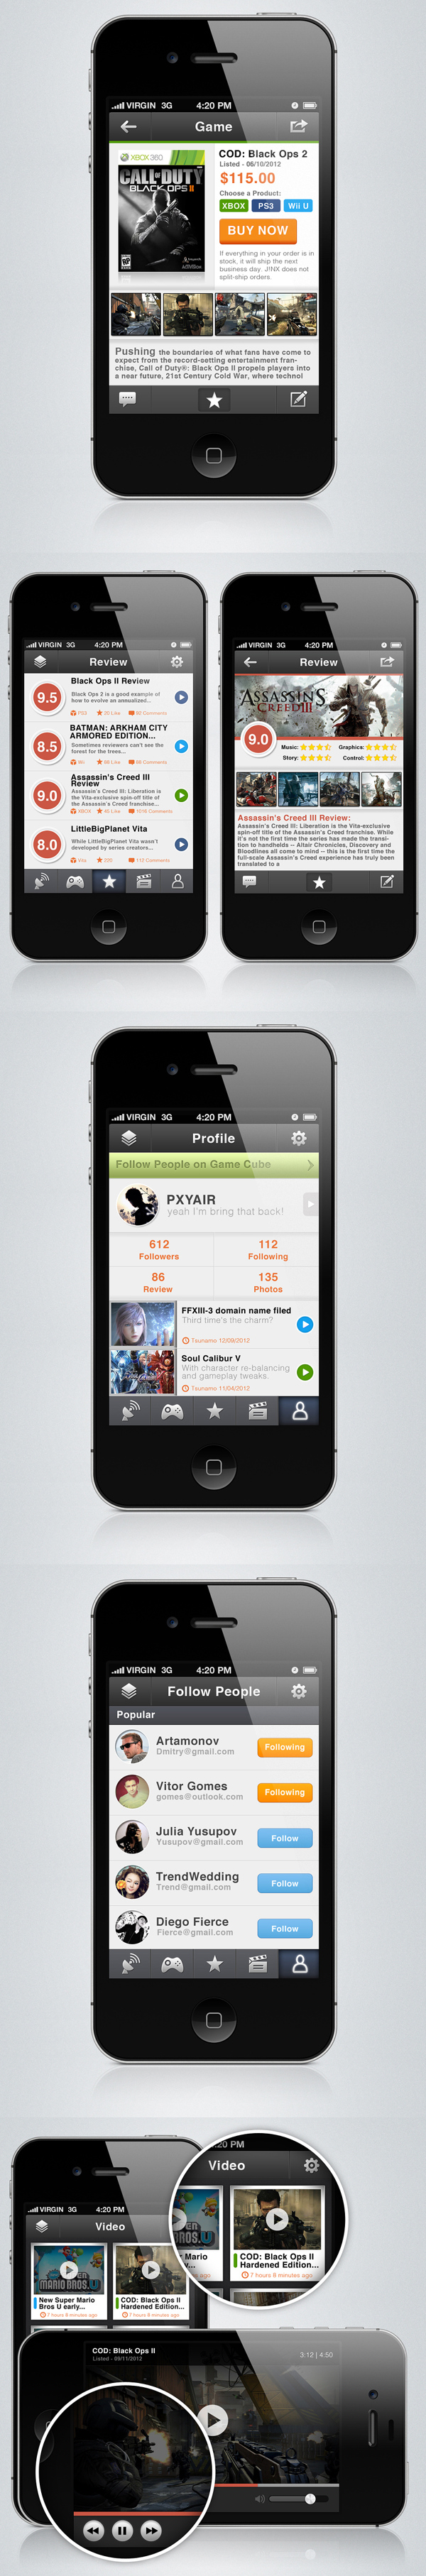 Game Cube - Iphone App By Pxyair , Via Behance-4346